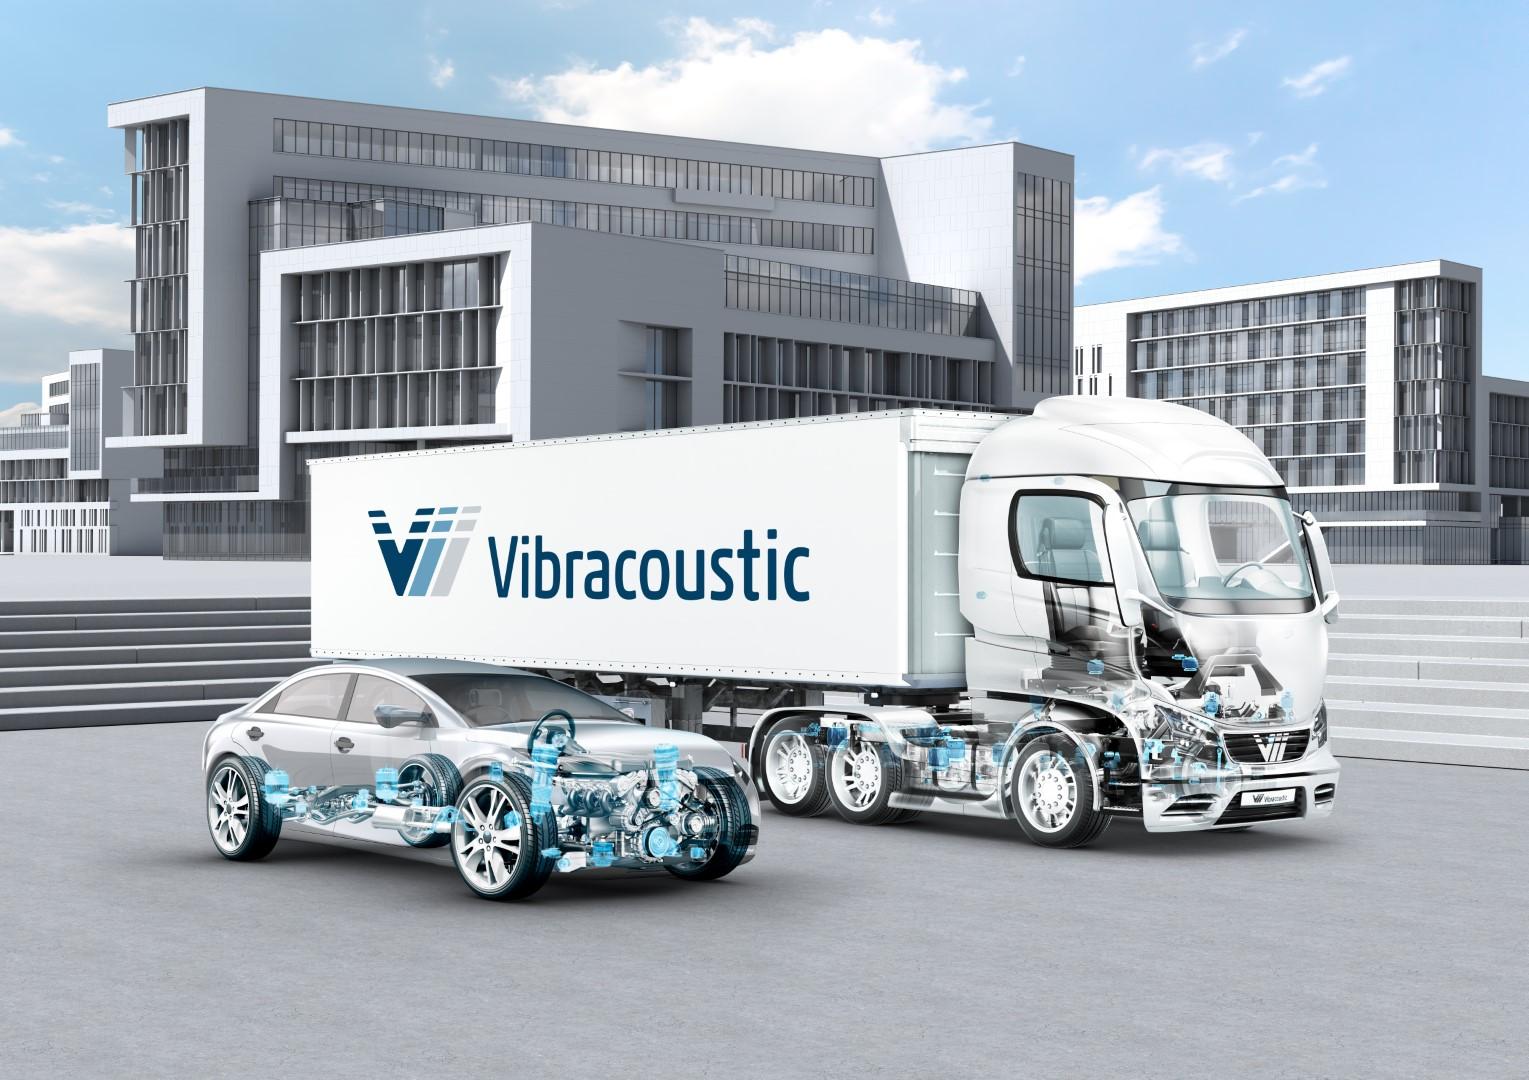 Vibracoustic_Car_Truck_Scenario_highres_2018_web